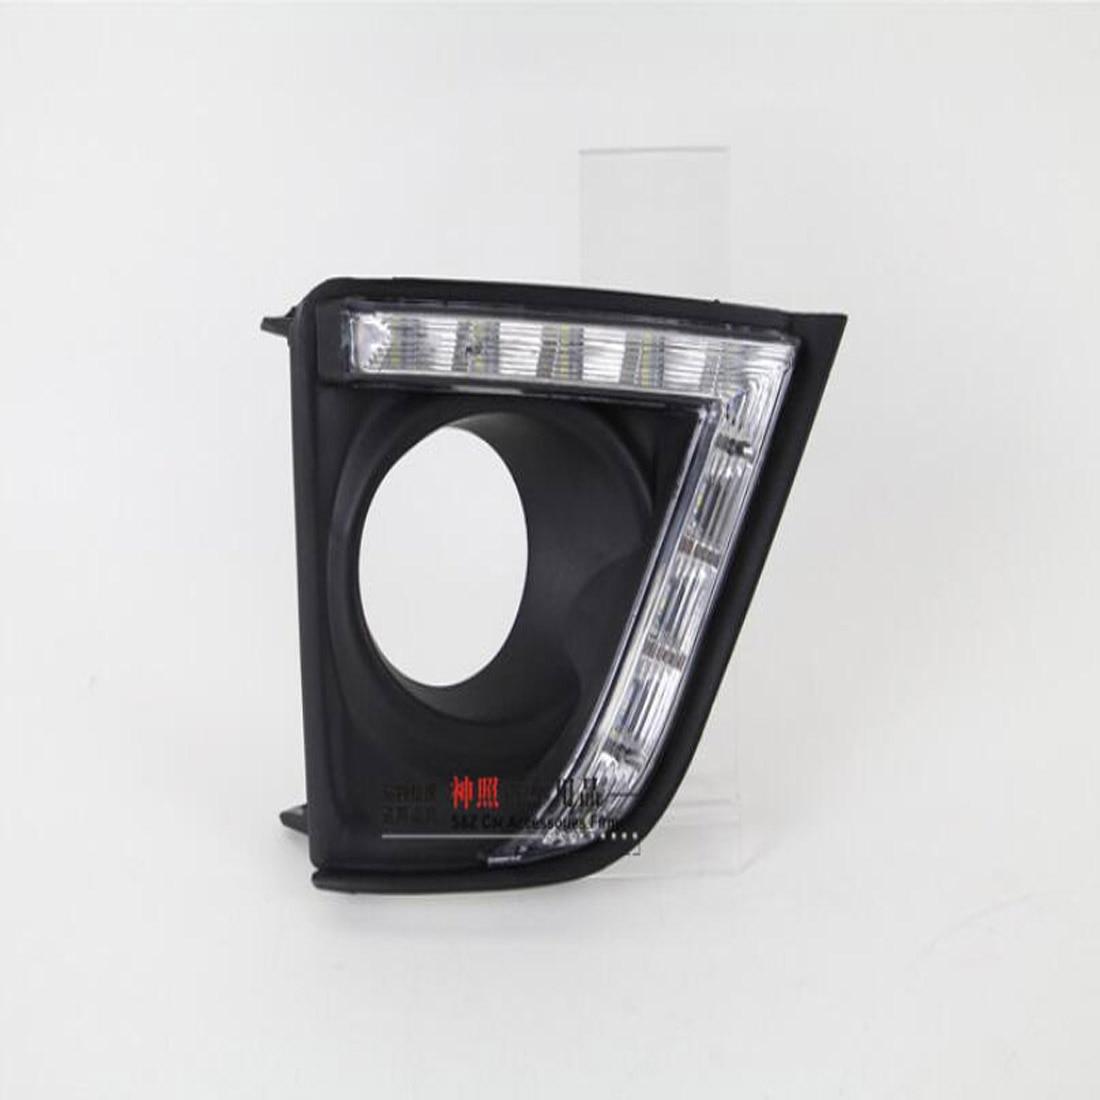 Dongzhen Auto For Toyota Corolla 2011-2014 Car Daytime Running Light DRL LED Turn Signal Light Highlight Fog Lamp Modified 2pcs<br>